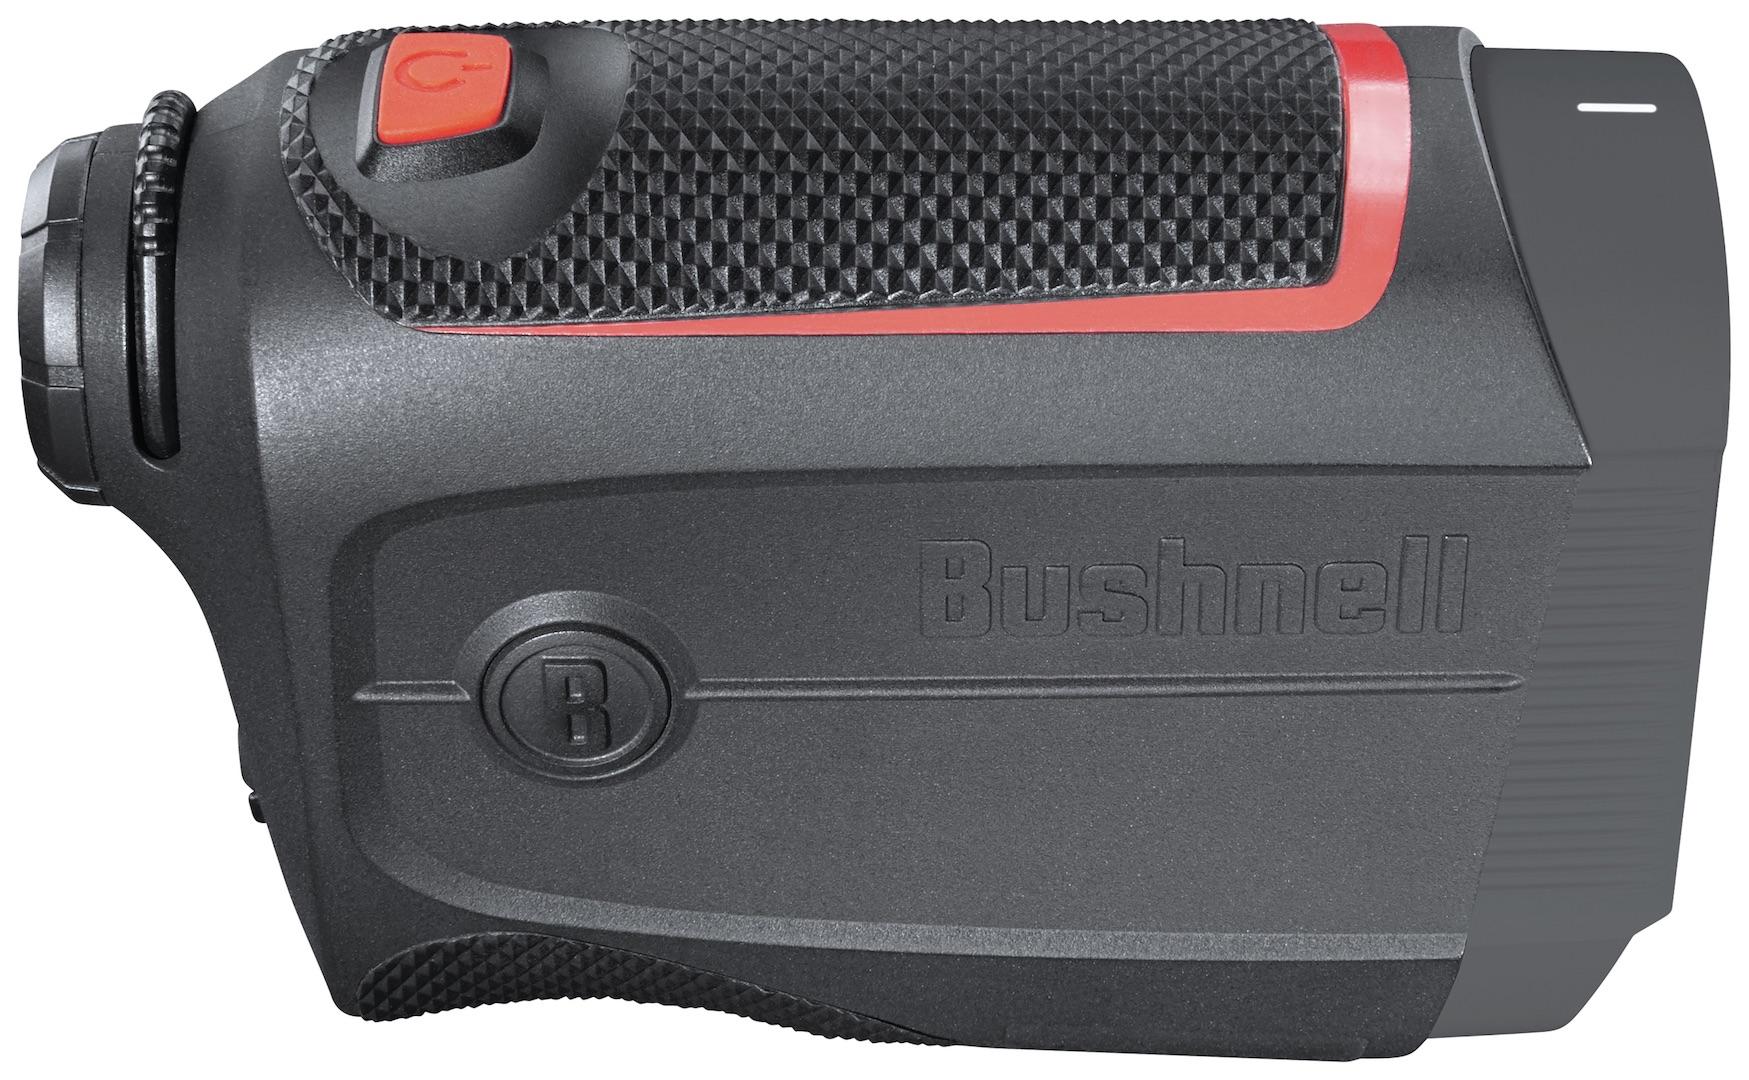 Bushnell launches revolutionary Hybrid rangefinder